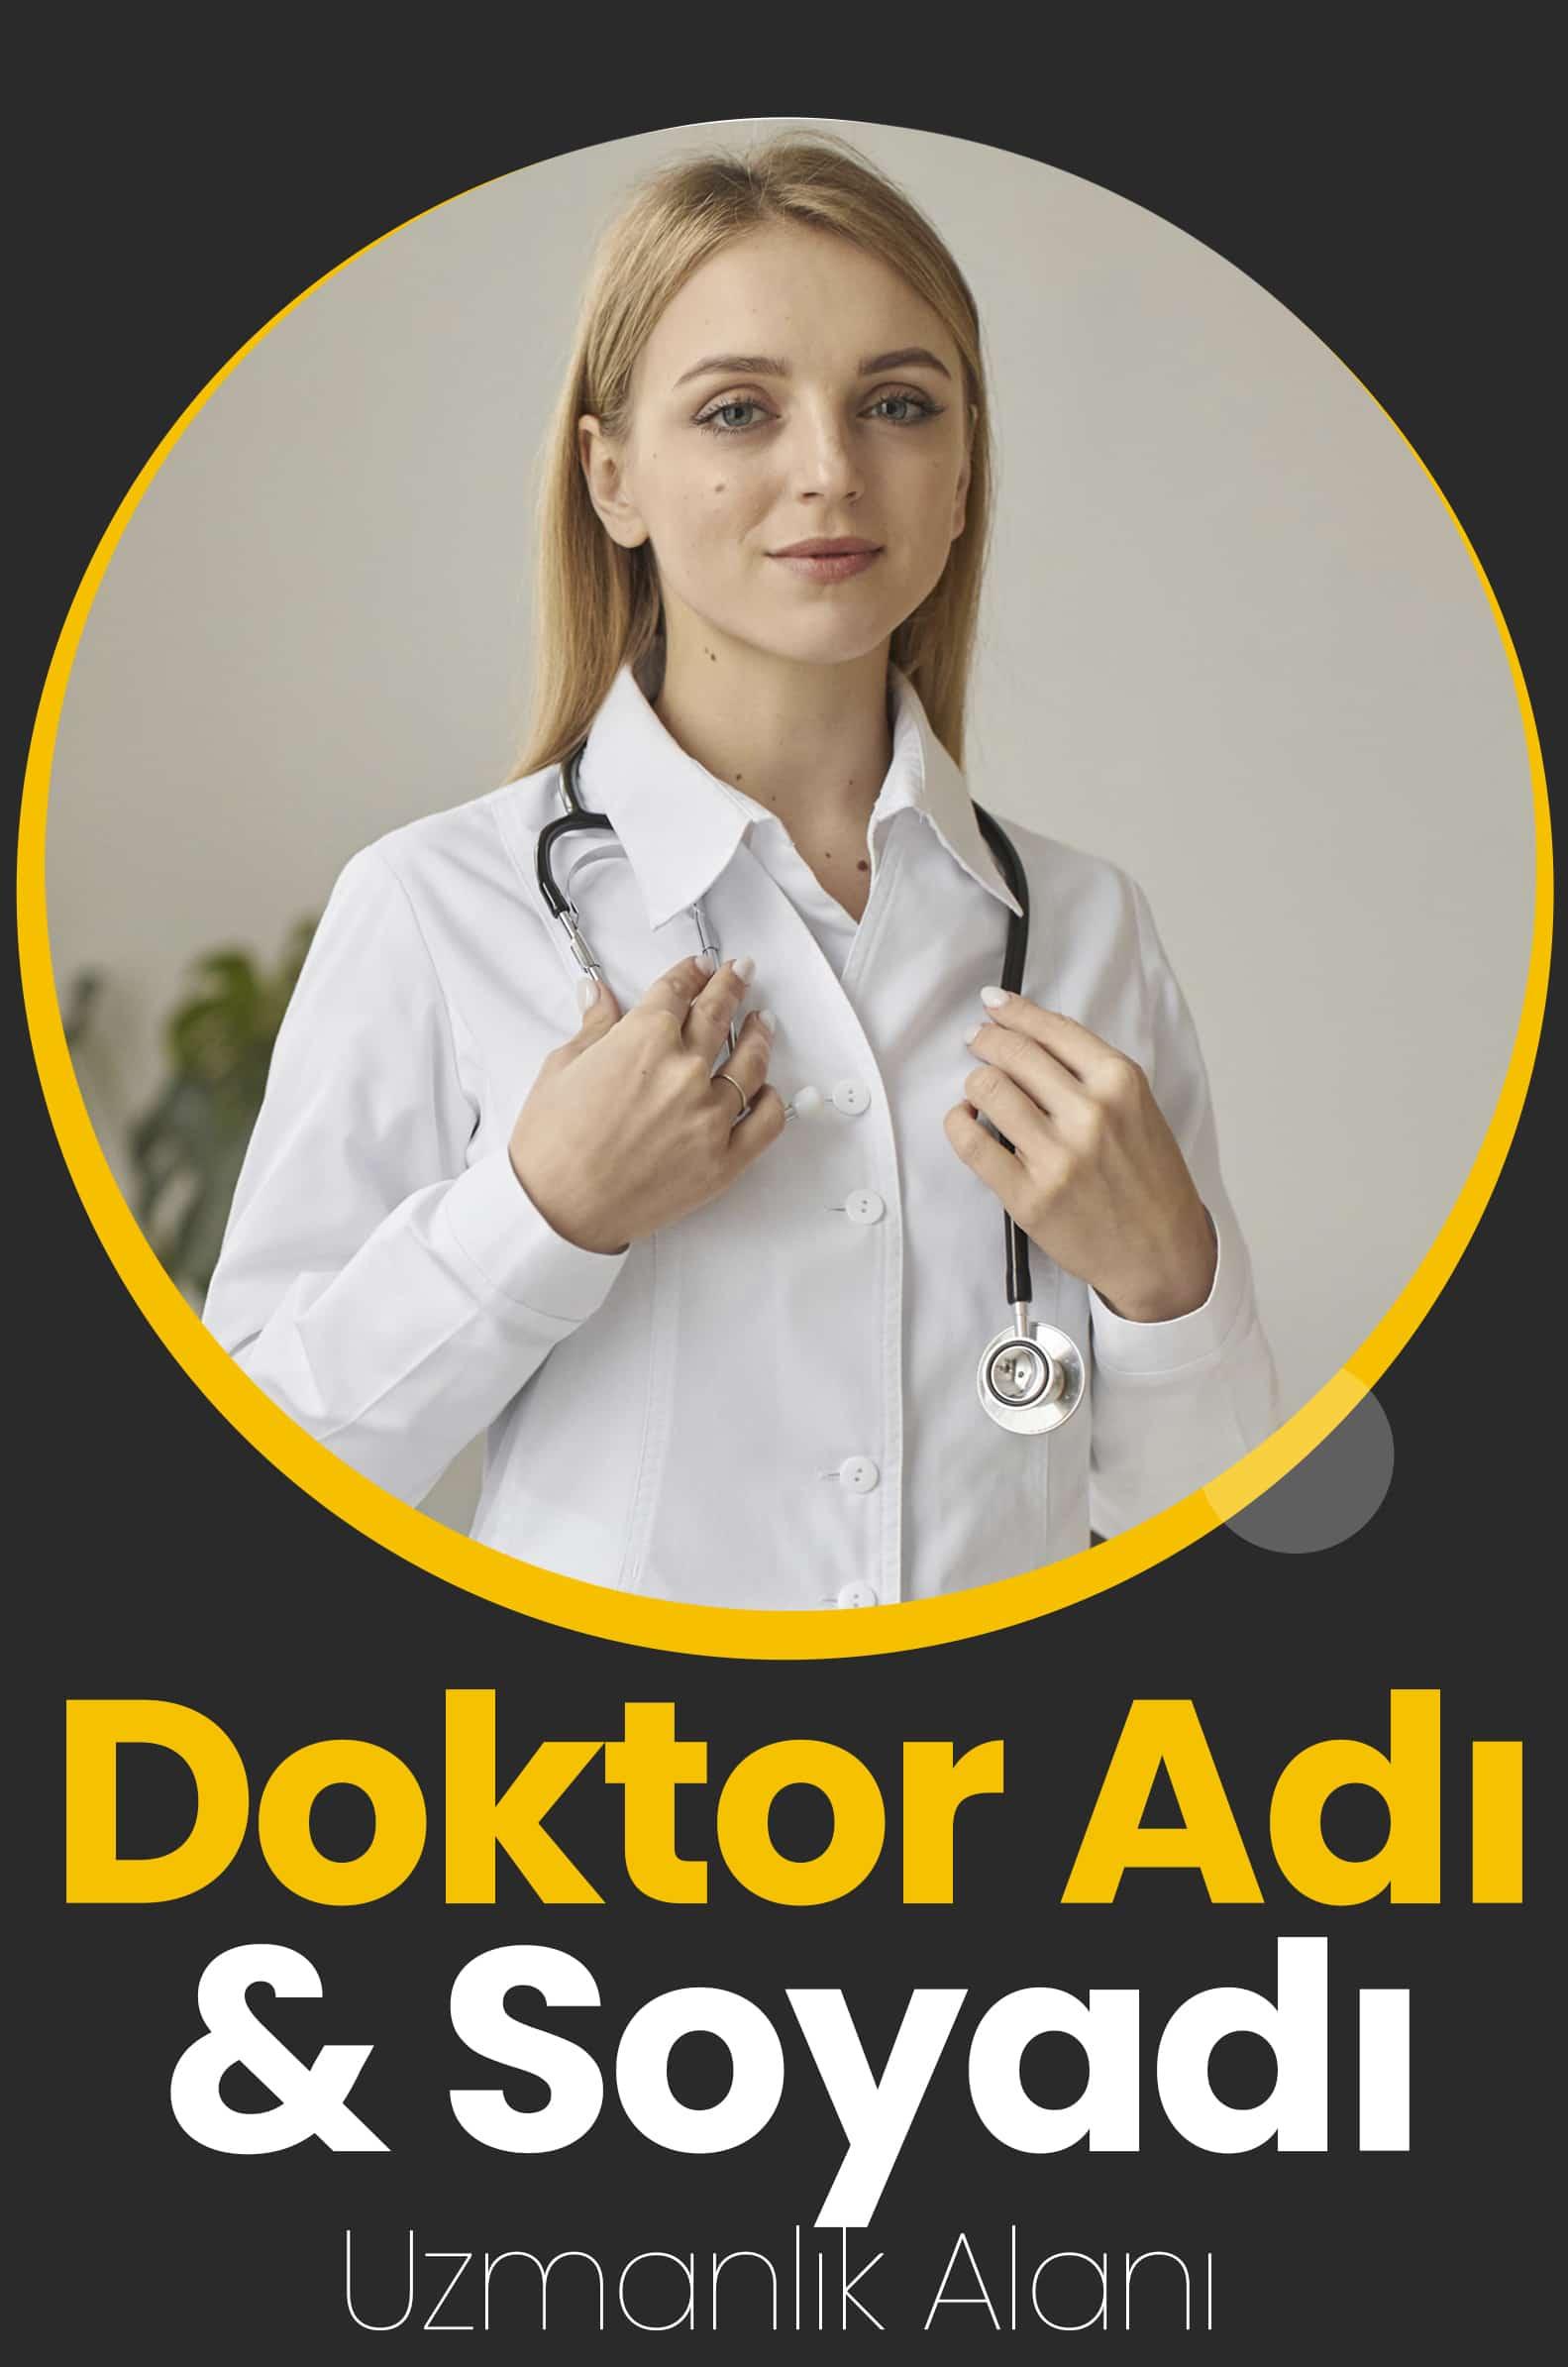 Örnek Doktor Profili